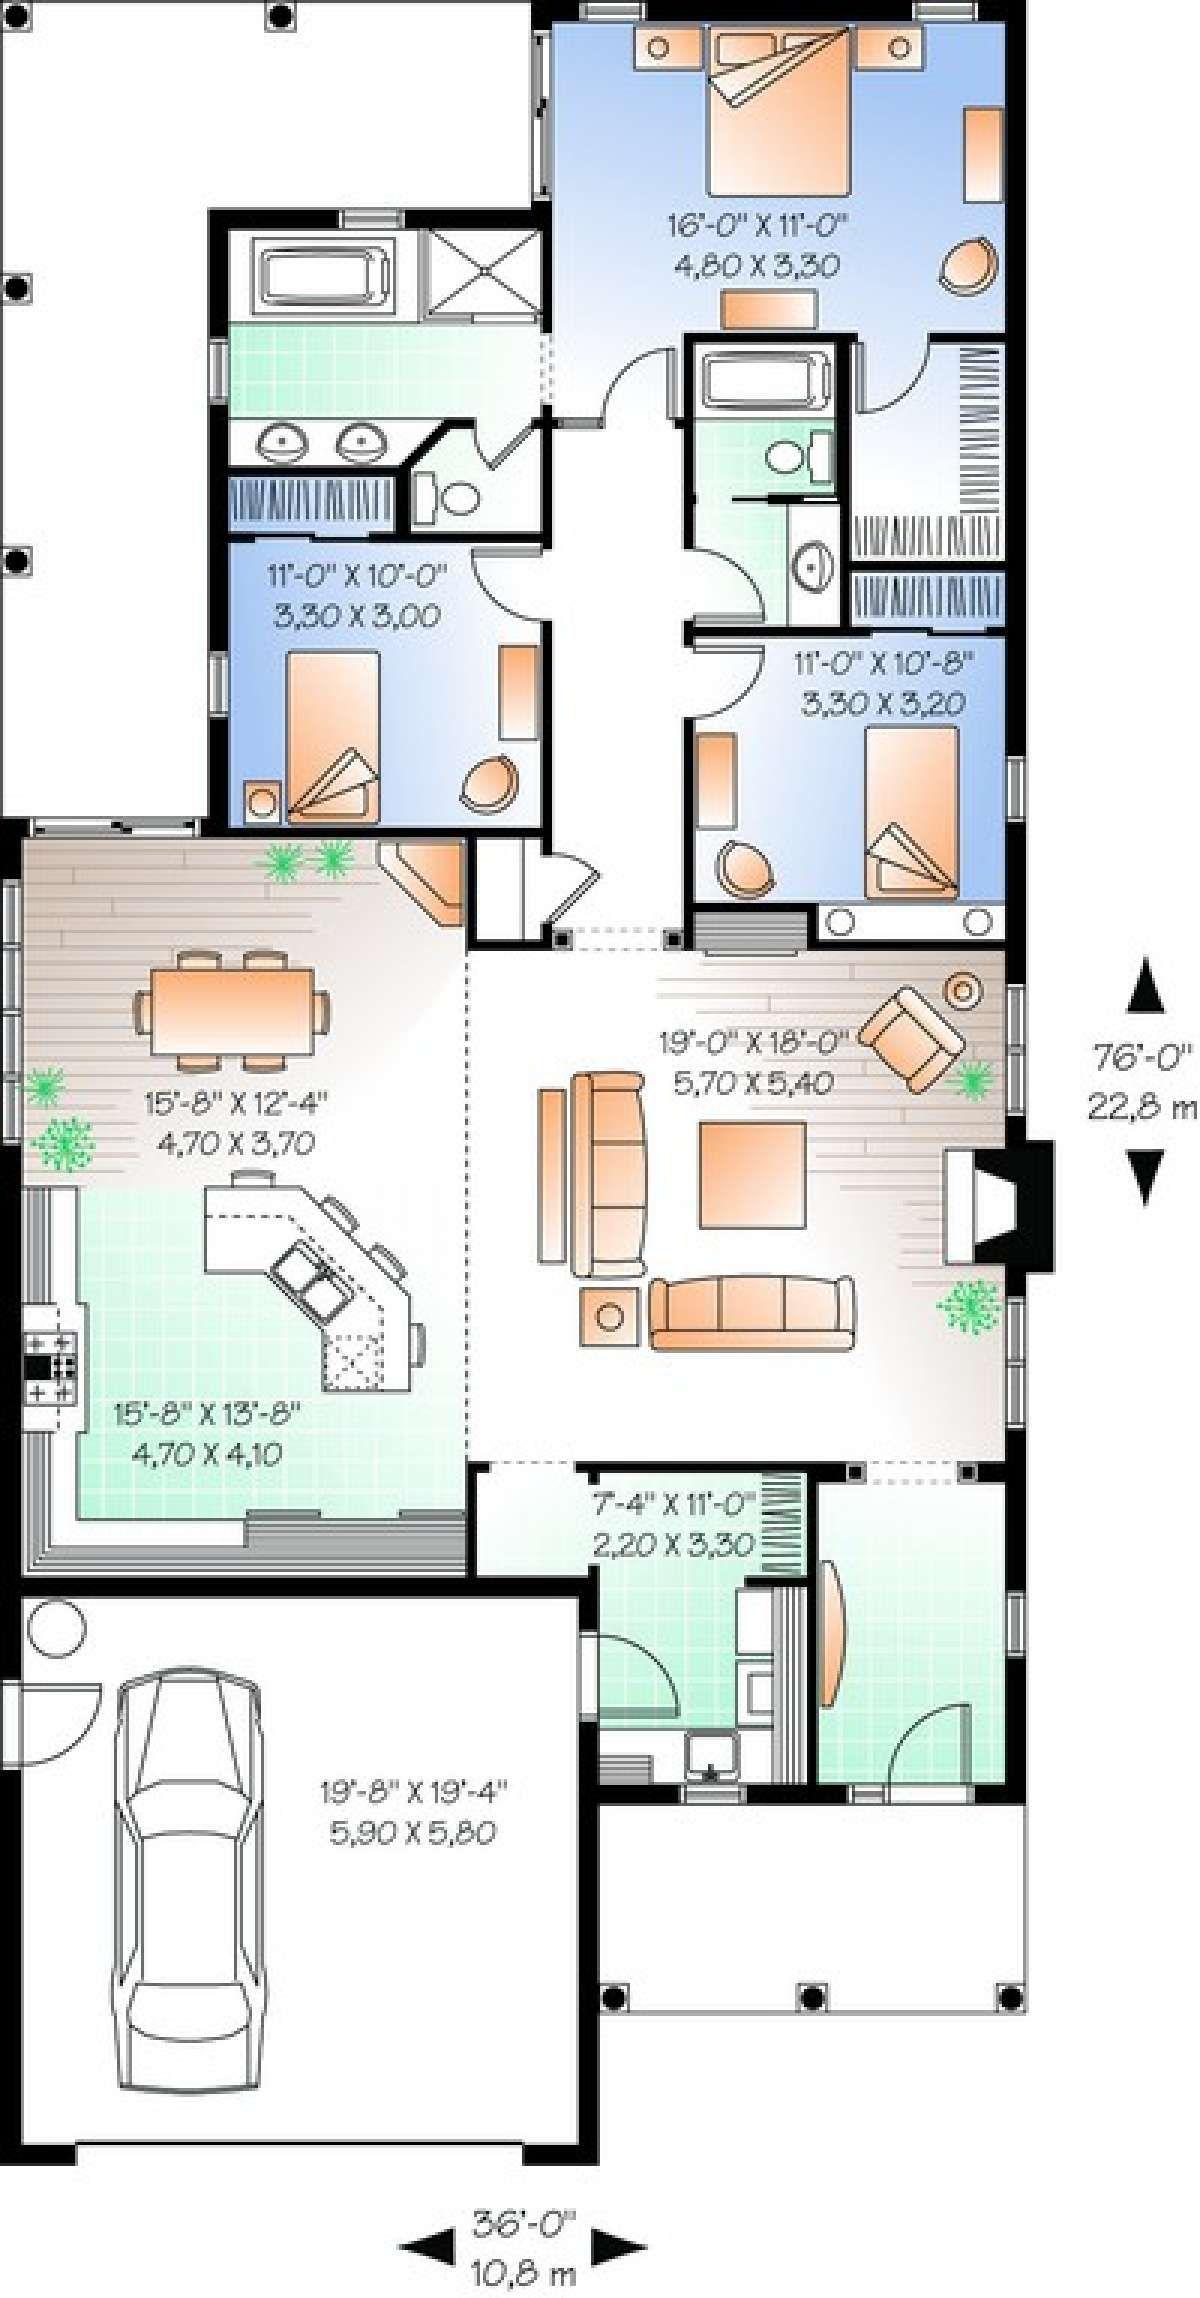 House Plan 034 00671 Narrow Lot Plan 1 838 Square Feet 3 Bedrooms 2 Bathrooms Narrow House Plans Drummond House Plans Narrow Lot House Plans